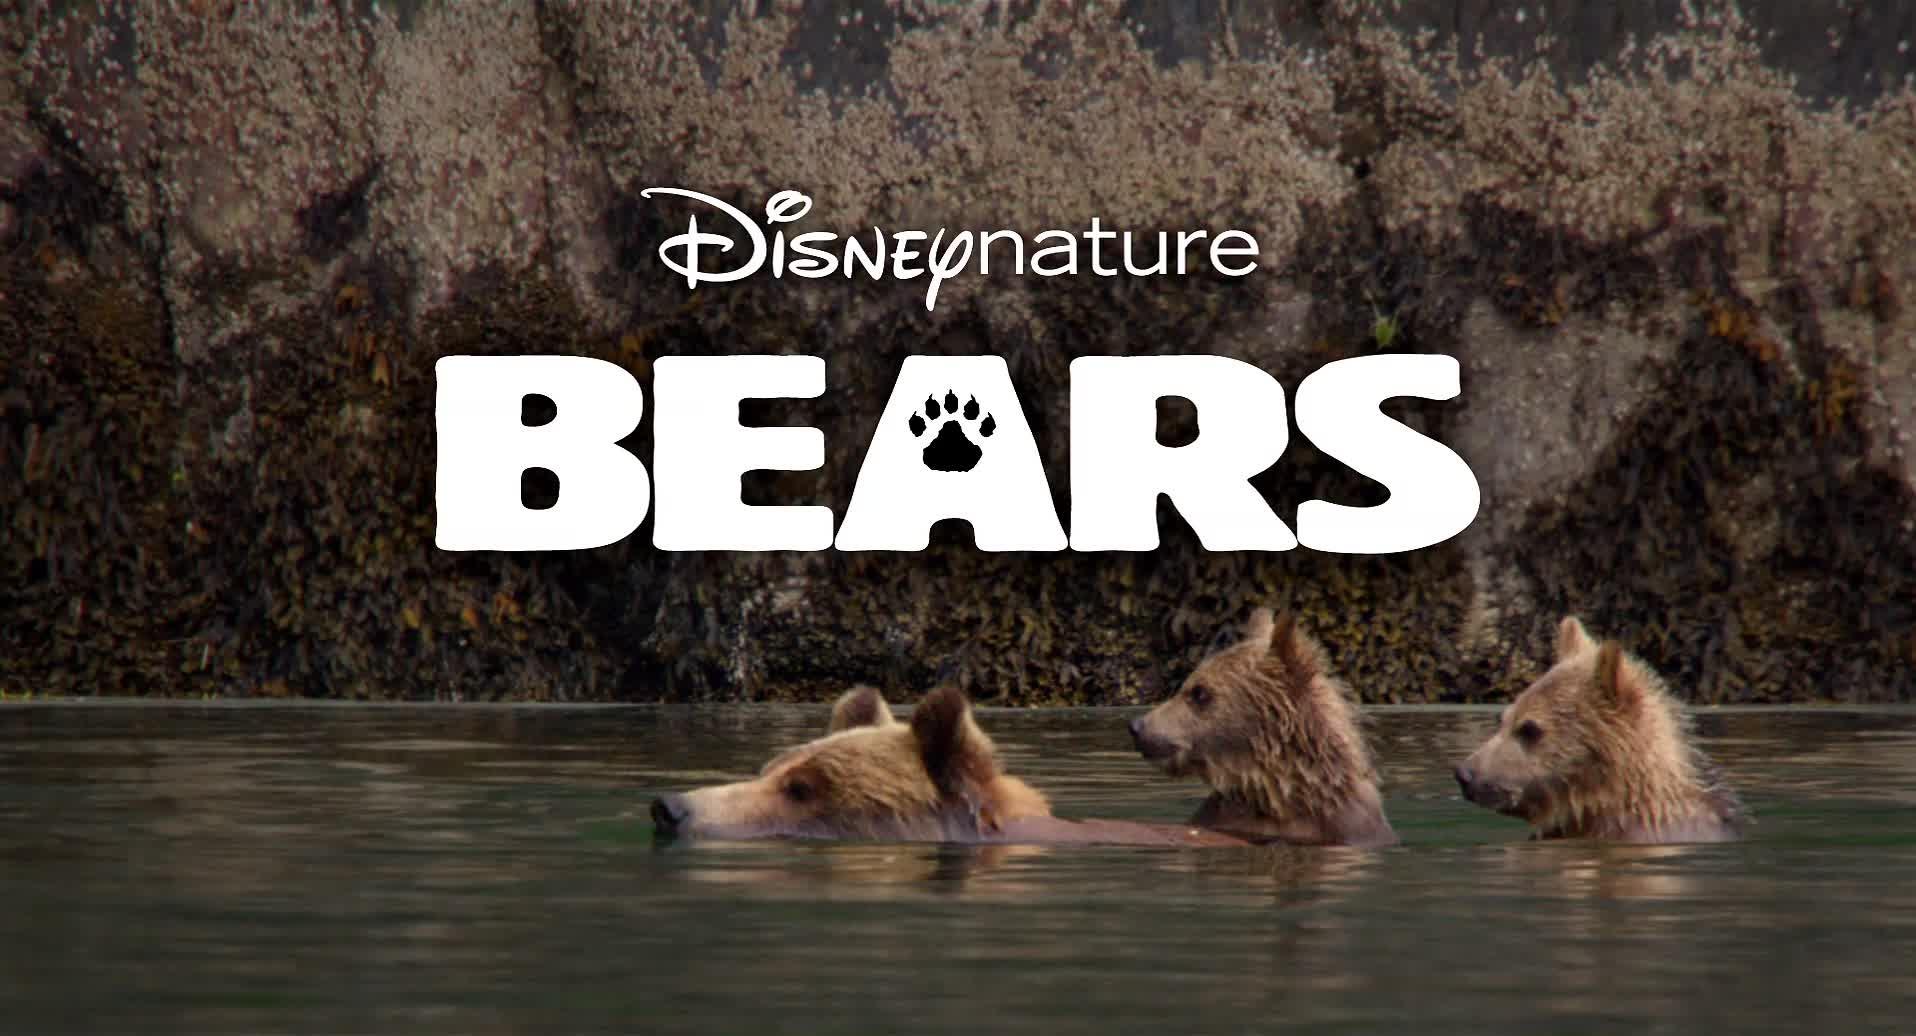 Disneynature Bears Trailer